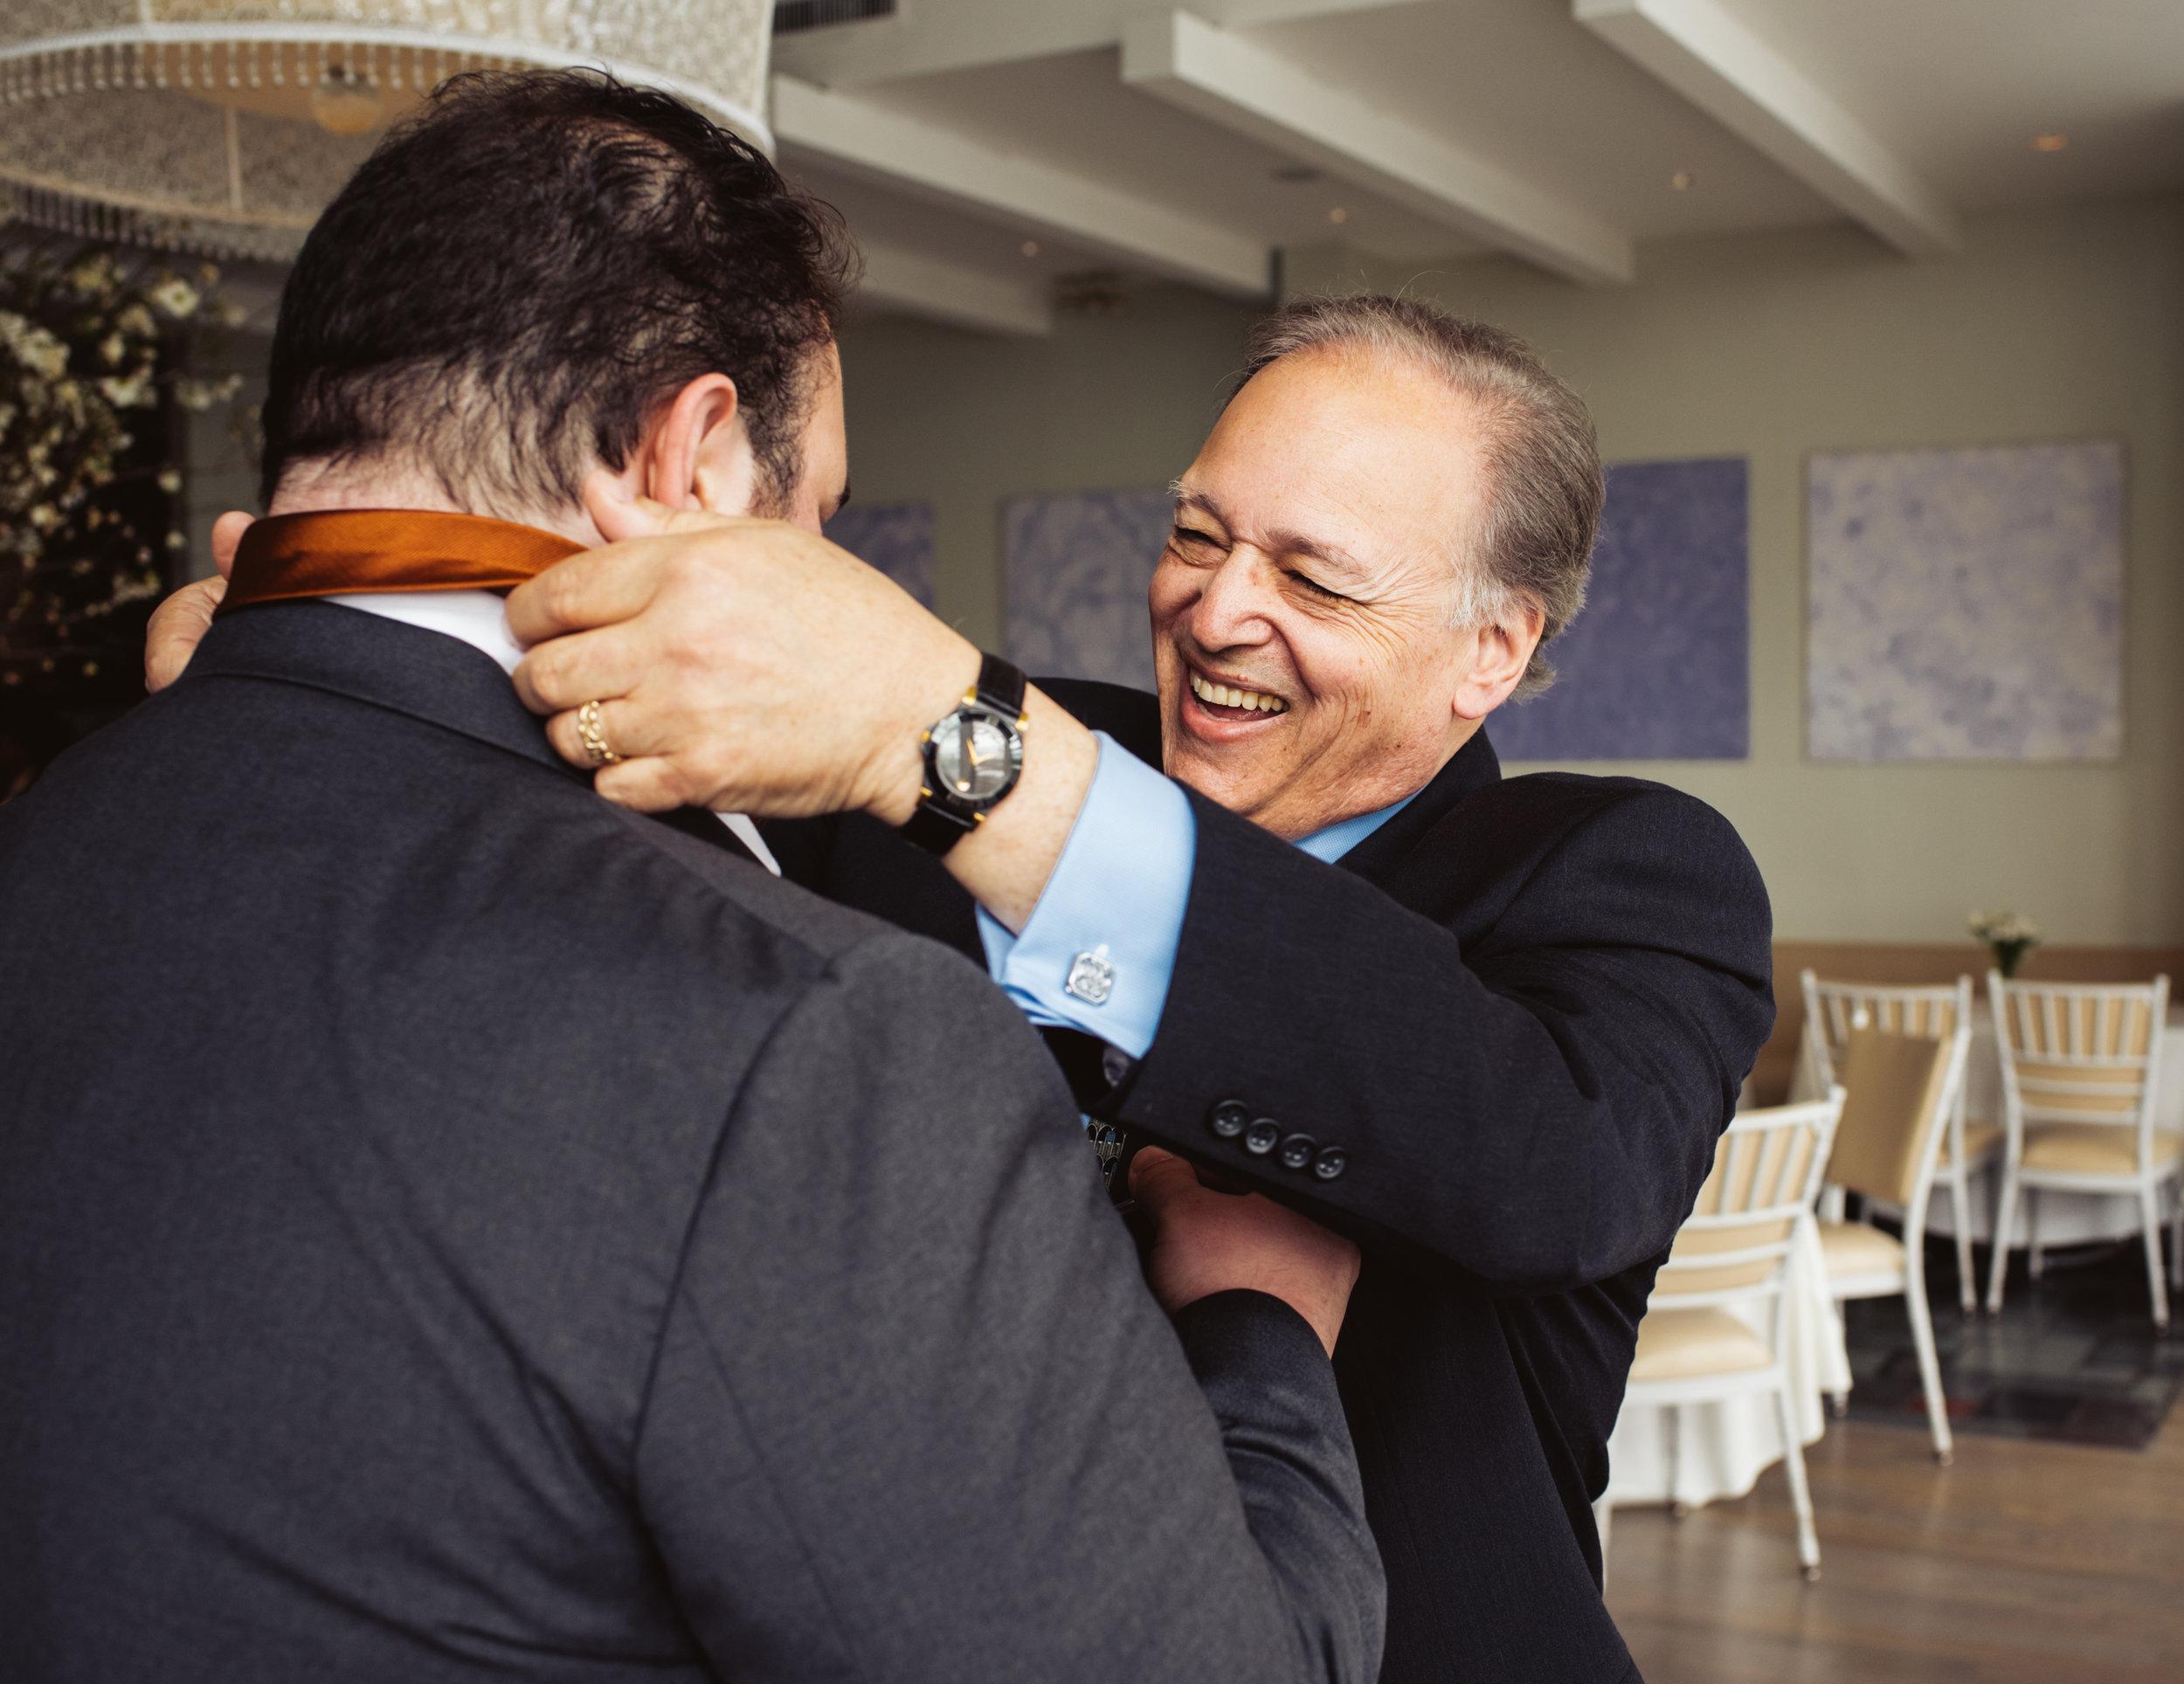 LIZA & JON - BATTERY PARK WEDDING - NYC INTIMATE WEDDING PHOTOGRAPHER - CHI-CHI AGBIM-188.jpg